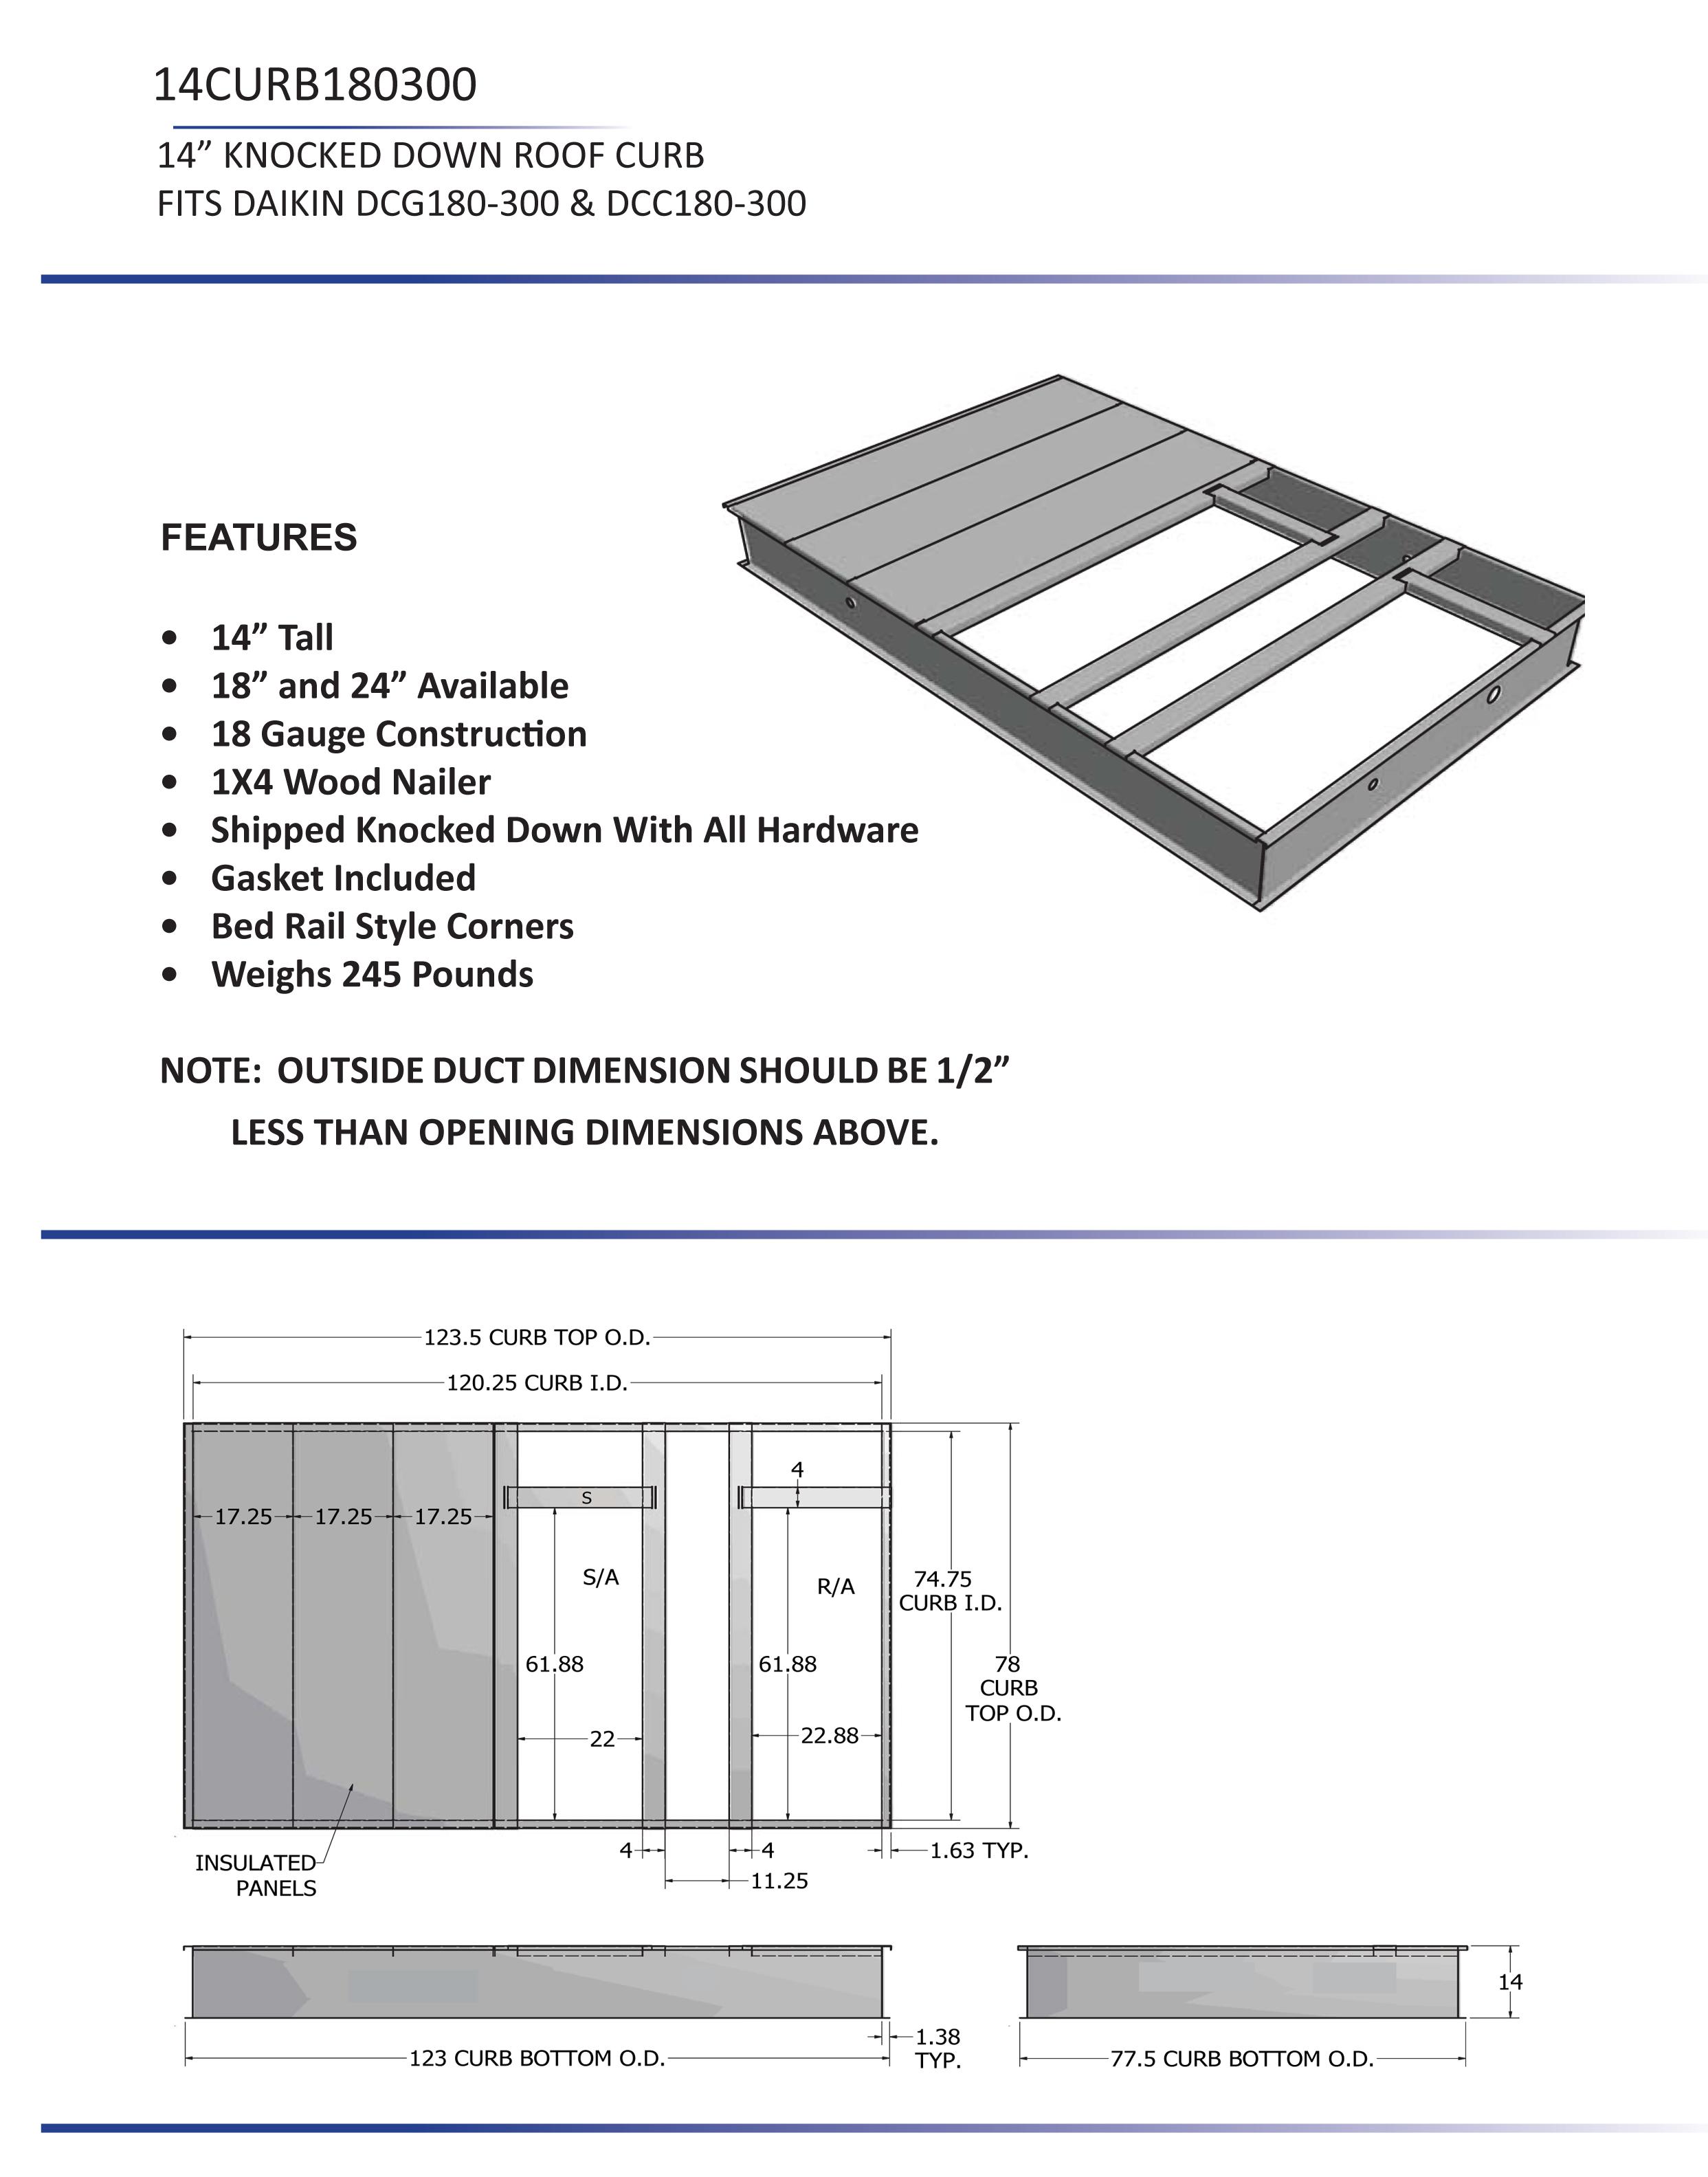 15 25 ton daikin 14 roof curb dcc dcg models 14curb180300 rh budgetheating com Air-Handler Wiring Diagram 2 Ton Mini Split Wiring-Diagram